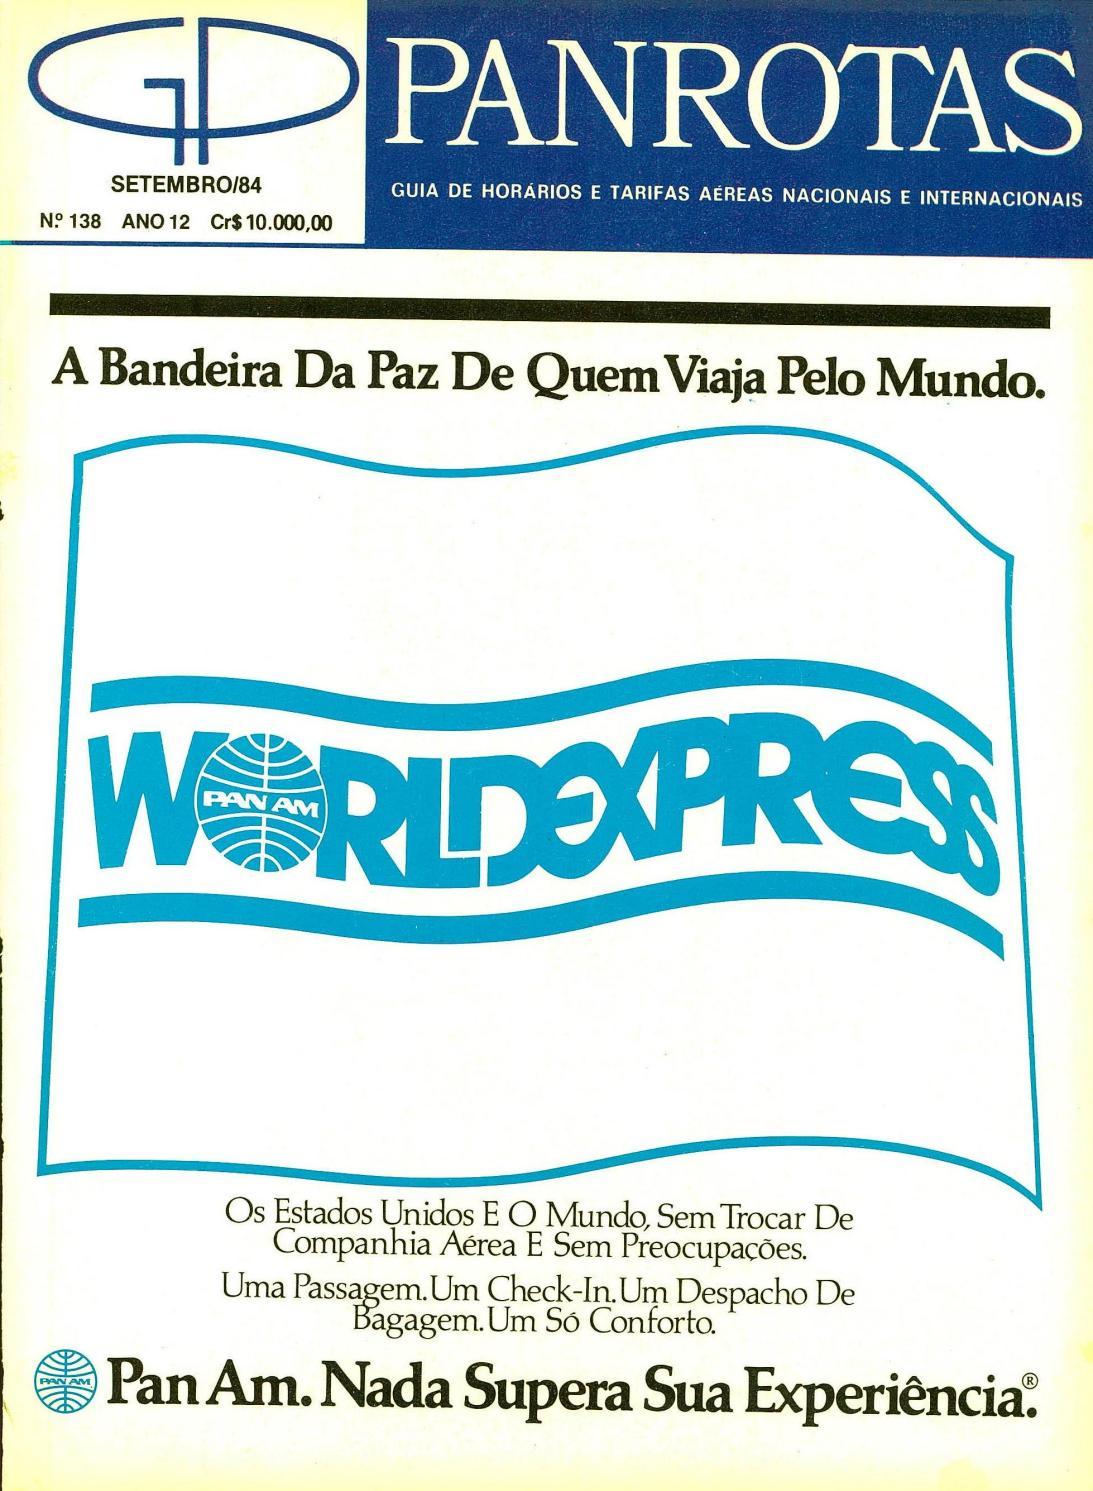 Guia PANROTAS - Edição 138 - Setembro 1984 by PANROTAS Editora - issuu f0a3b5fd5c4